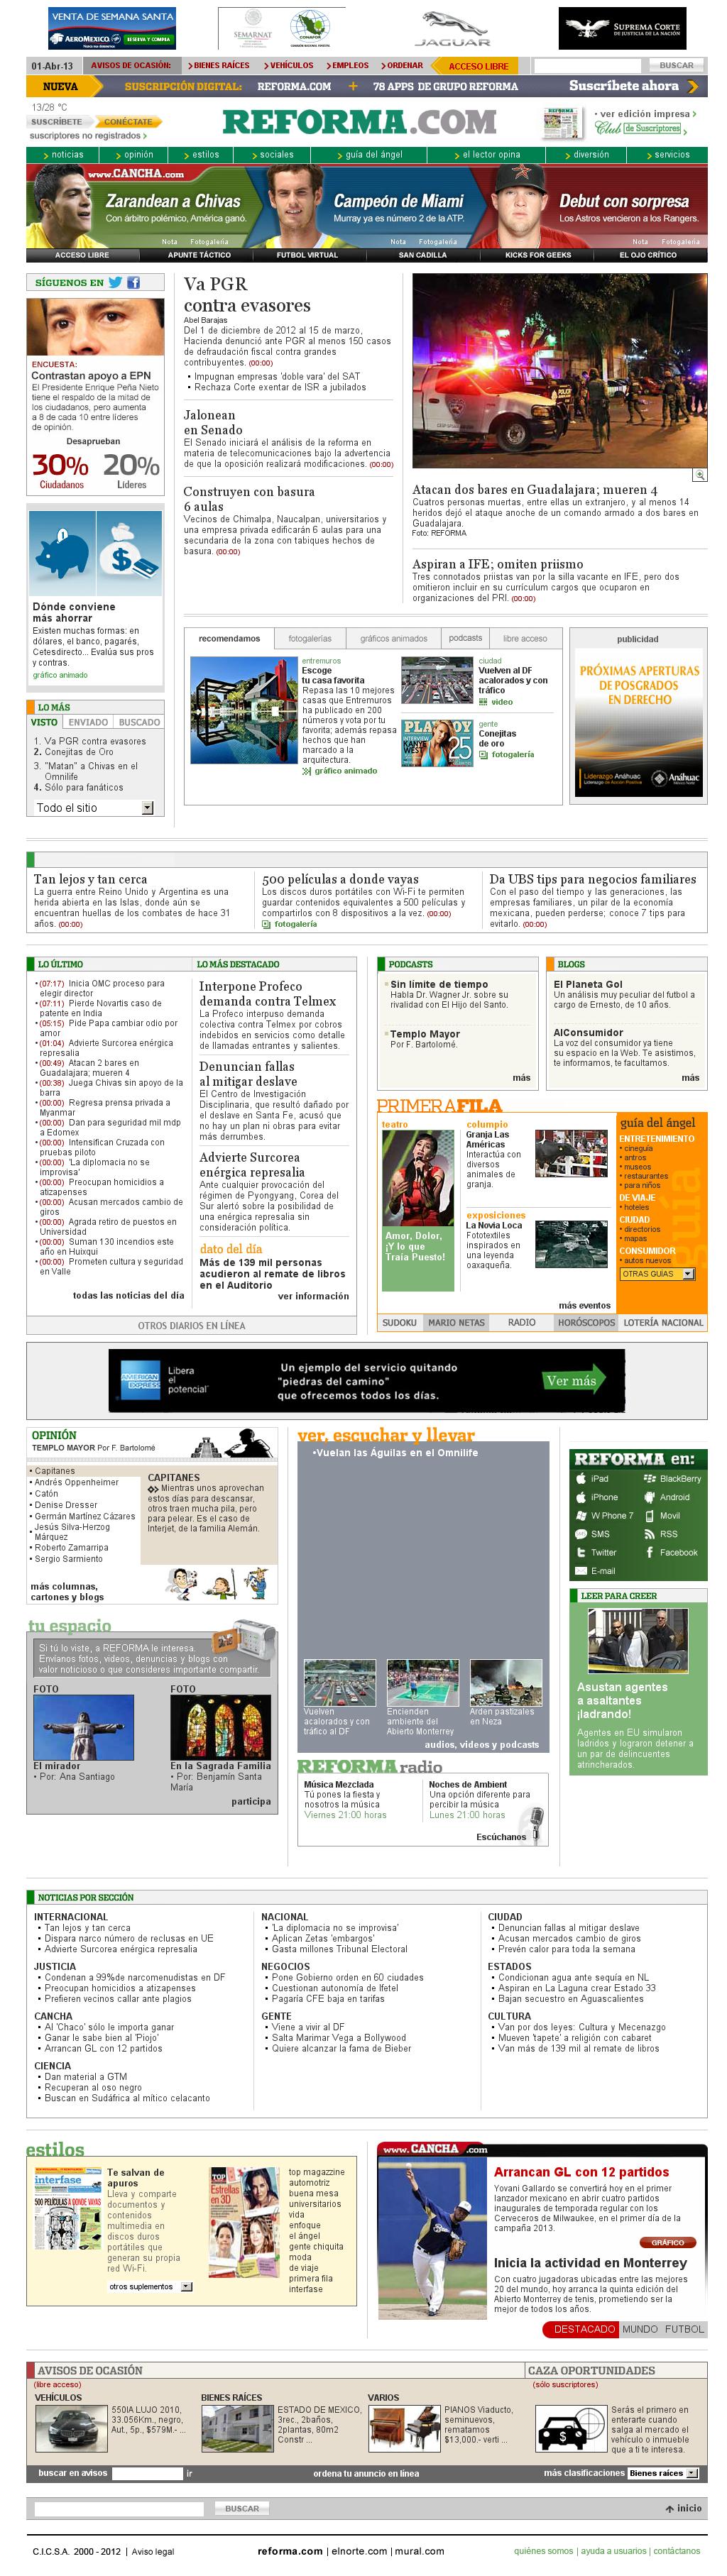 Reforma.com at Monday April 1, 2013, 2:18 p.m. UTC